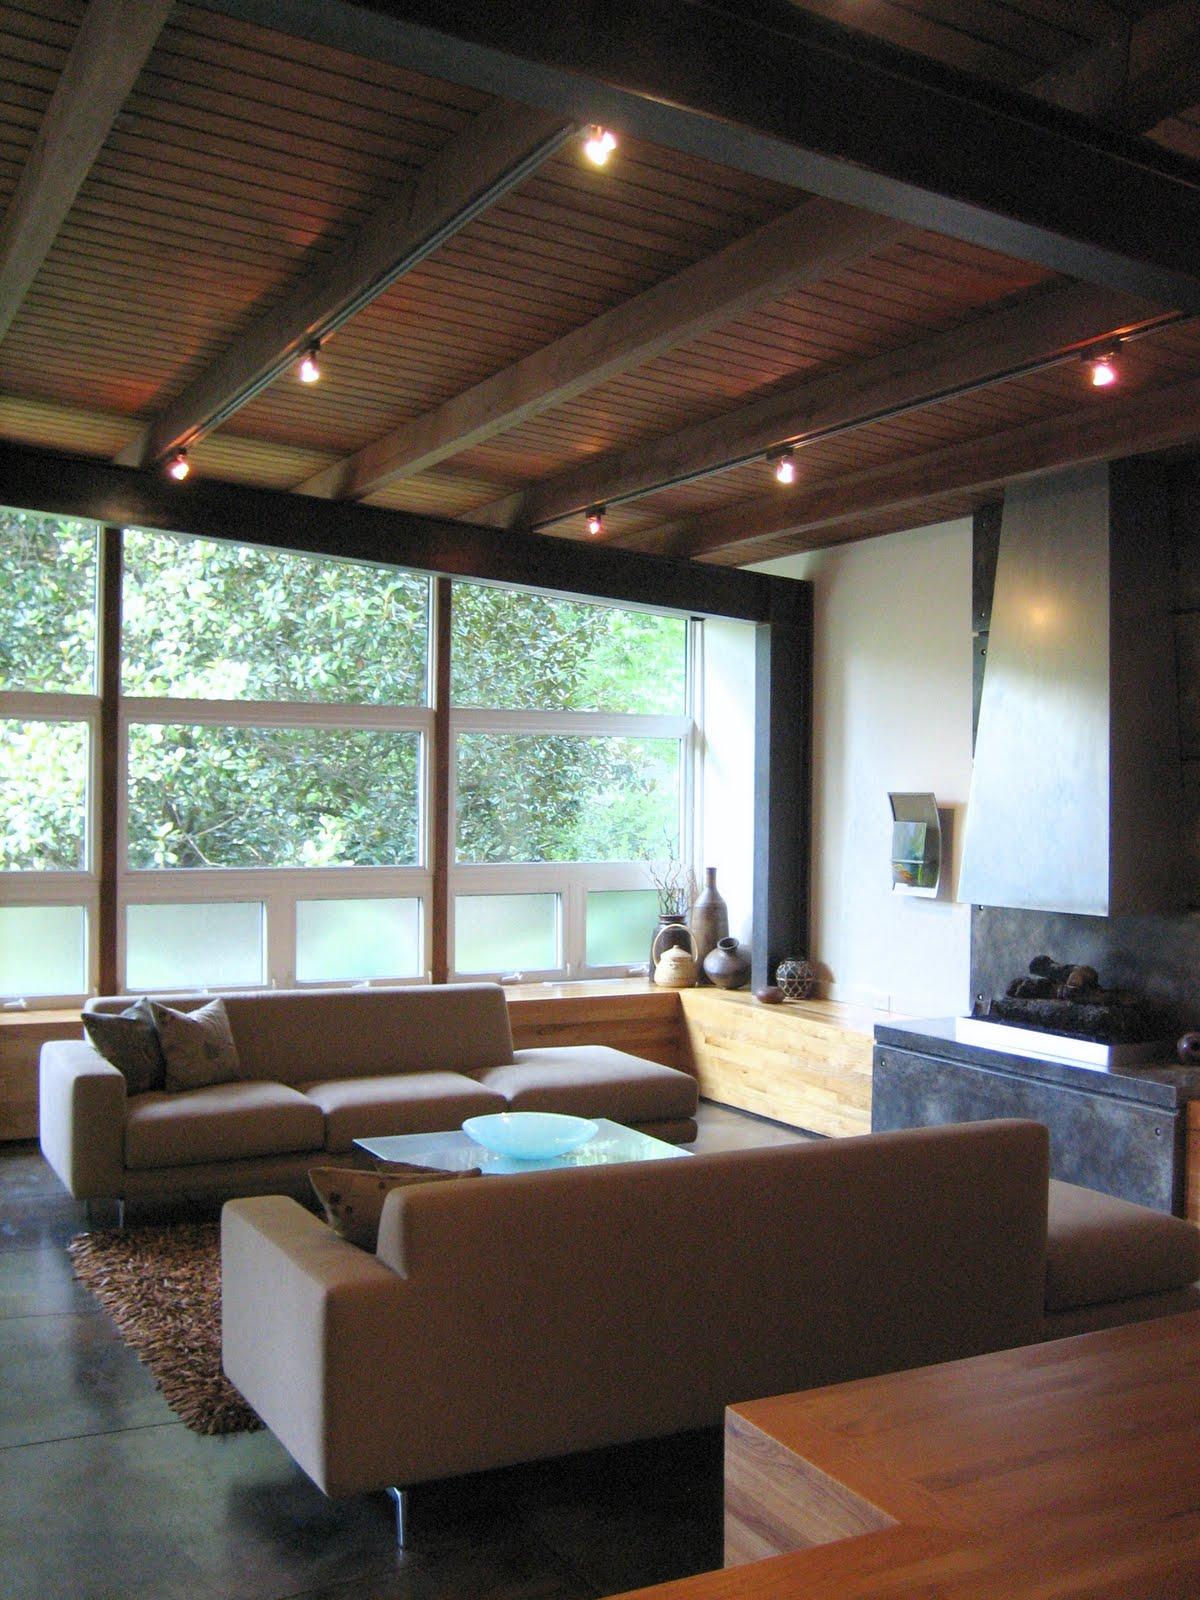 Atlanta Real Estate and Home Improvement News: July 2010